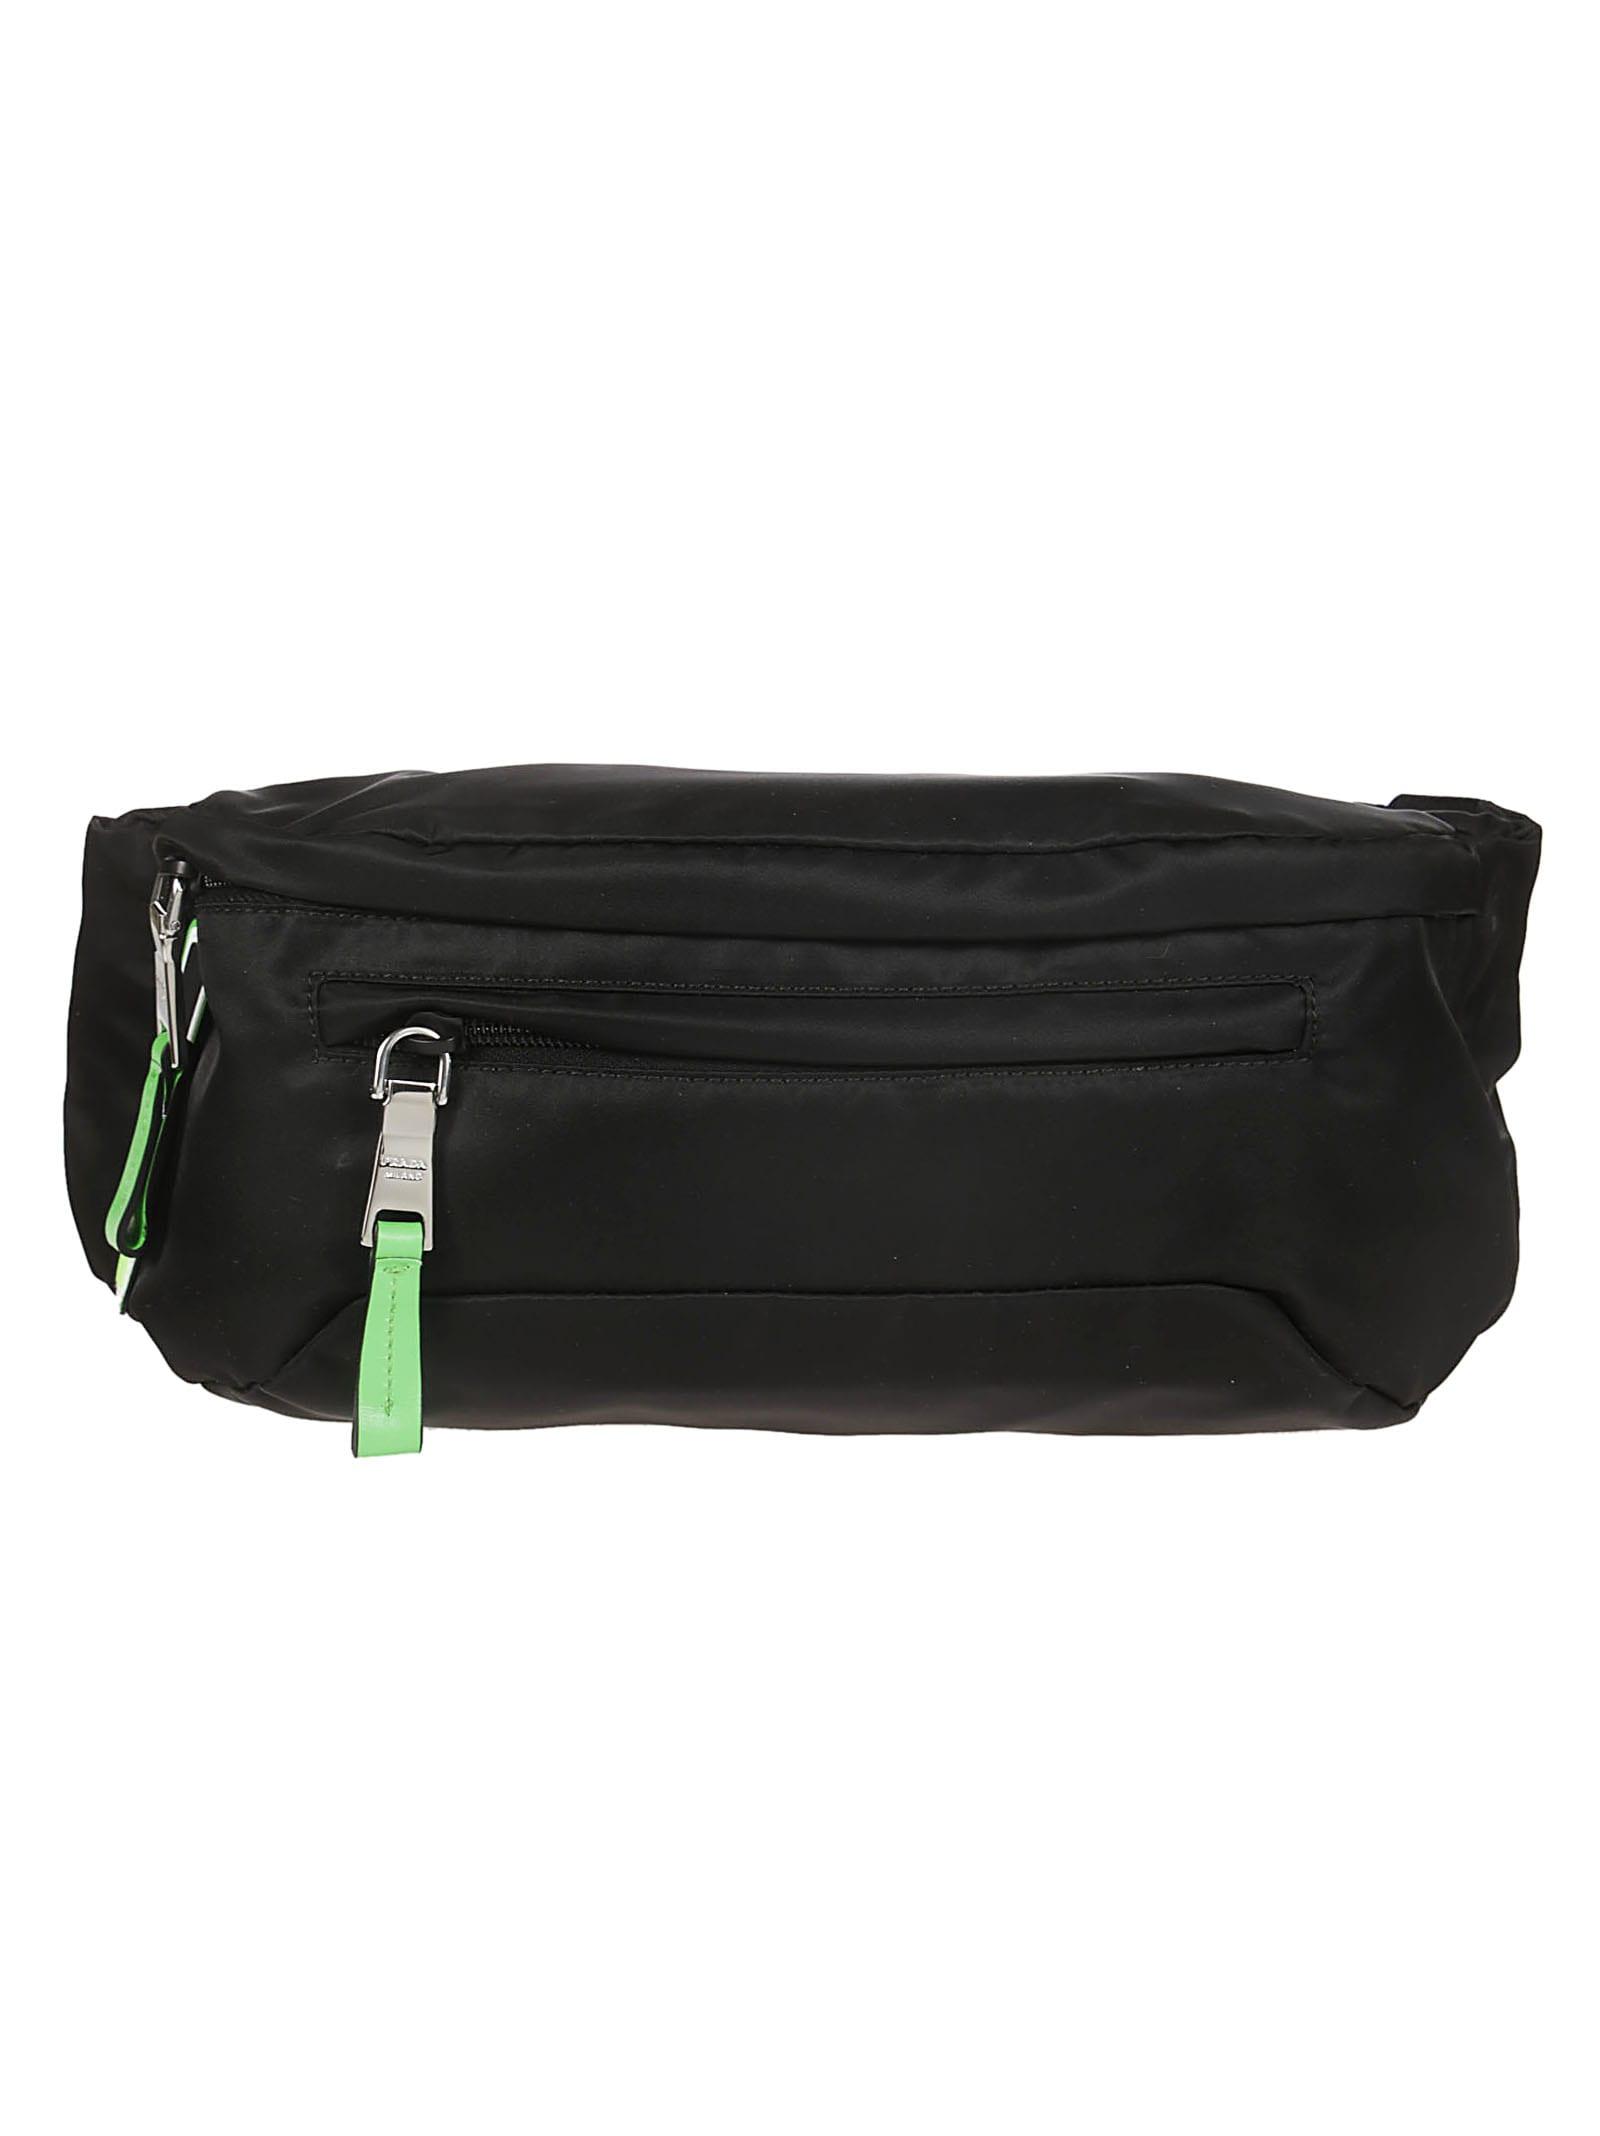 09ae1f025b Prada Vintage Belt Bag